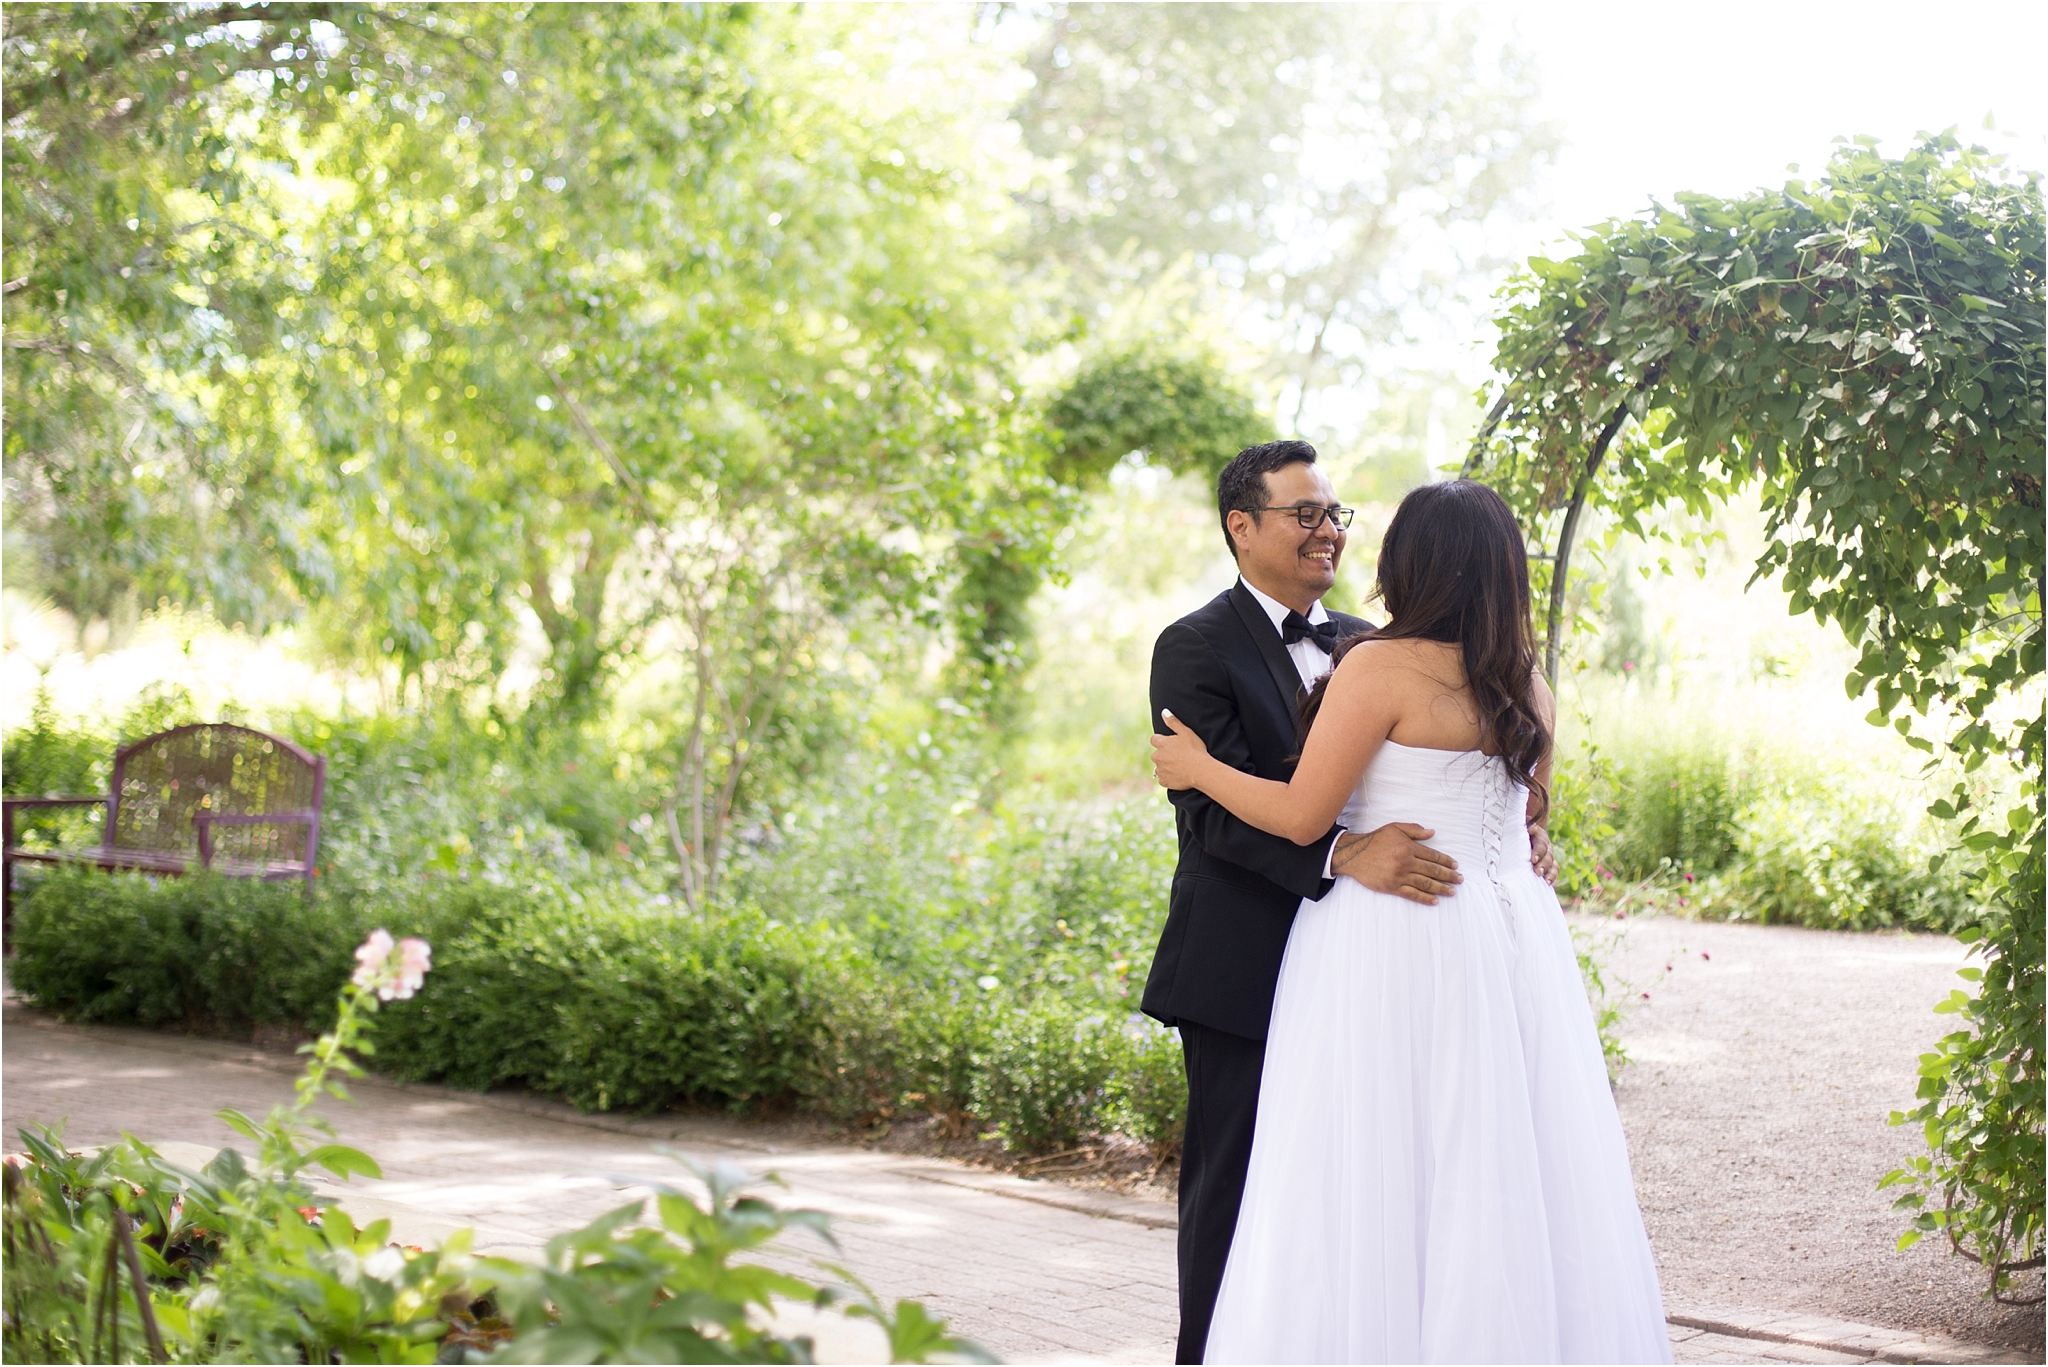 kayla kitts photography - albuquerque botanical gardens - albuquerque wedding photographer - albuquerque wedding - the banque lofts wedding_0004.jpg